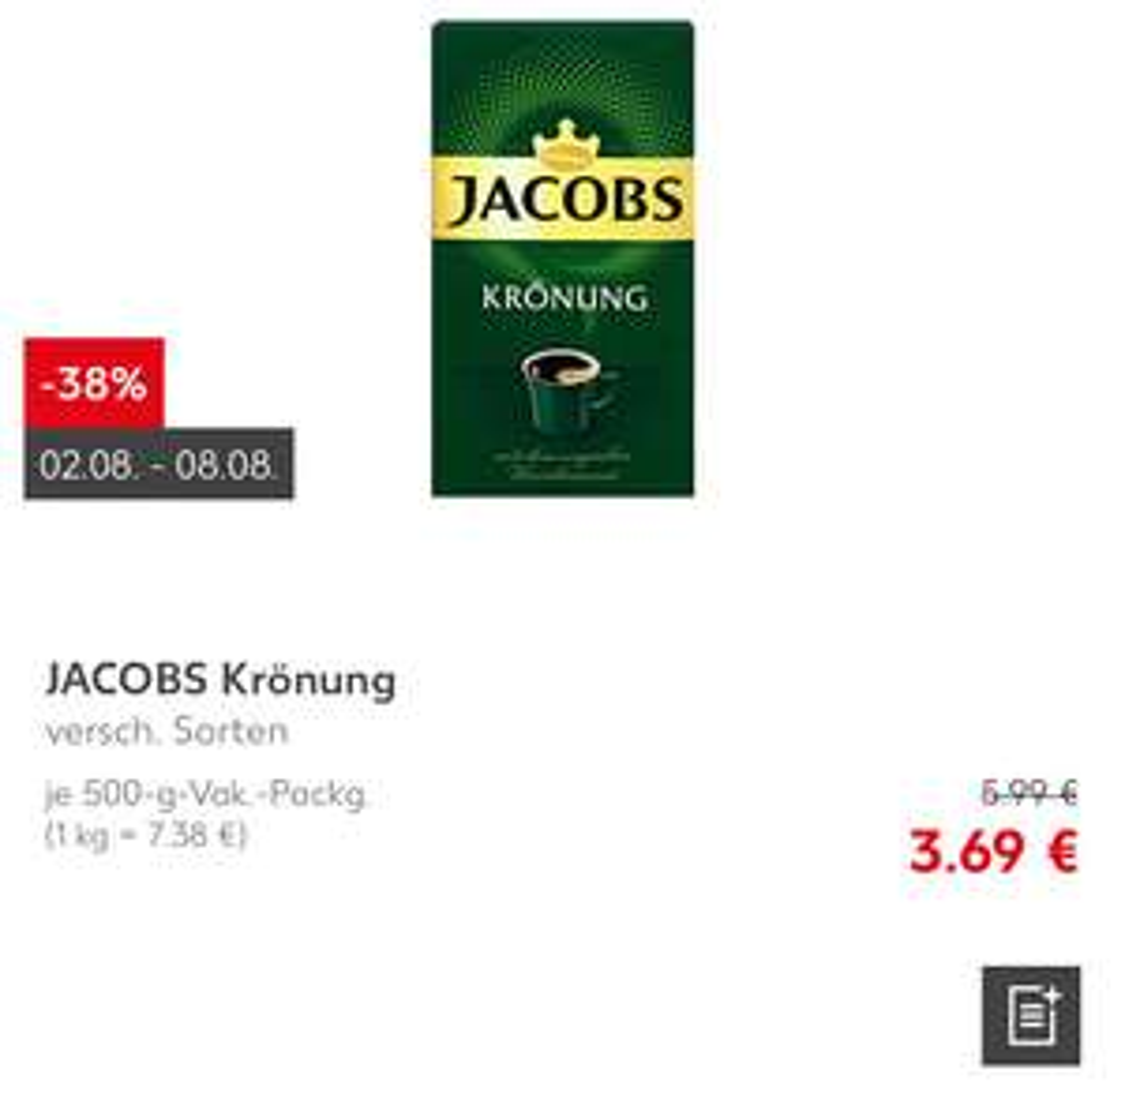 [Kaufland bundesweit] ab 02.08 - 08.08 Jacobs Krönung 500g